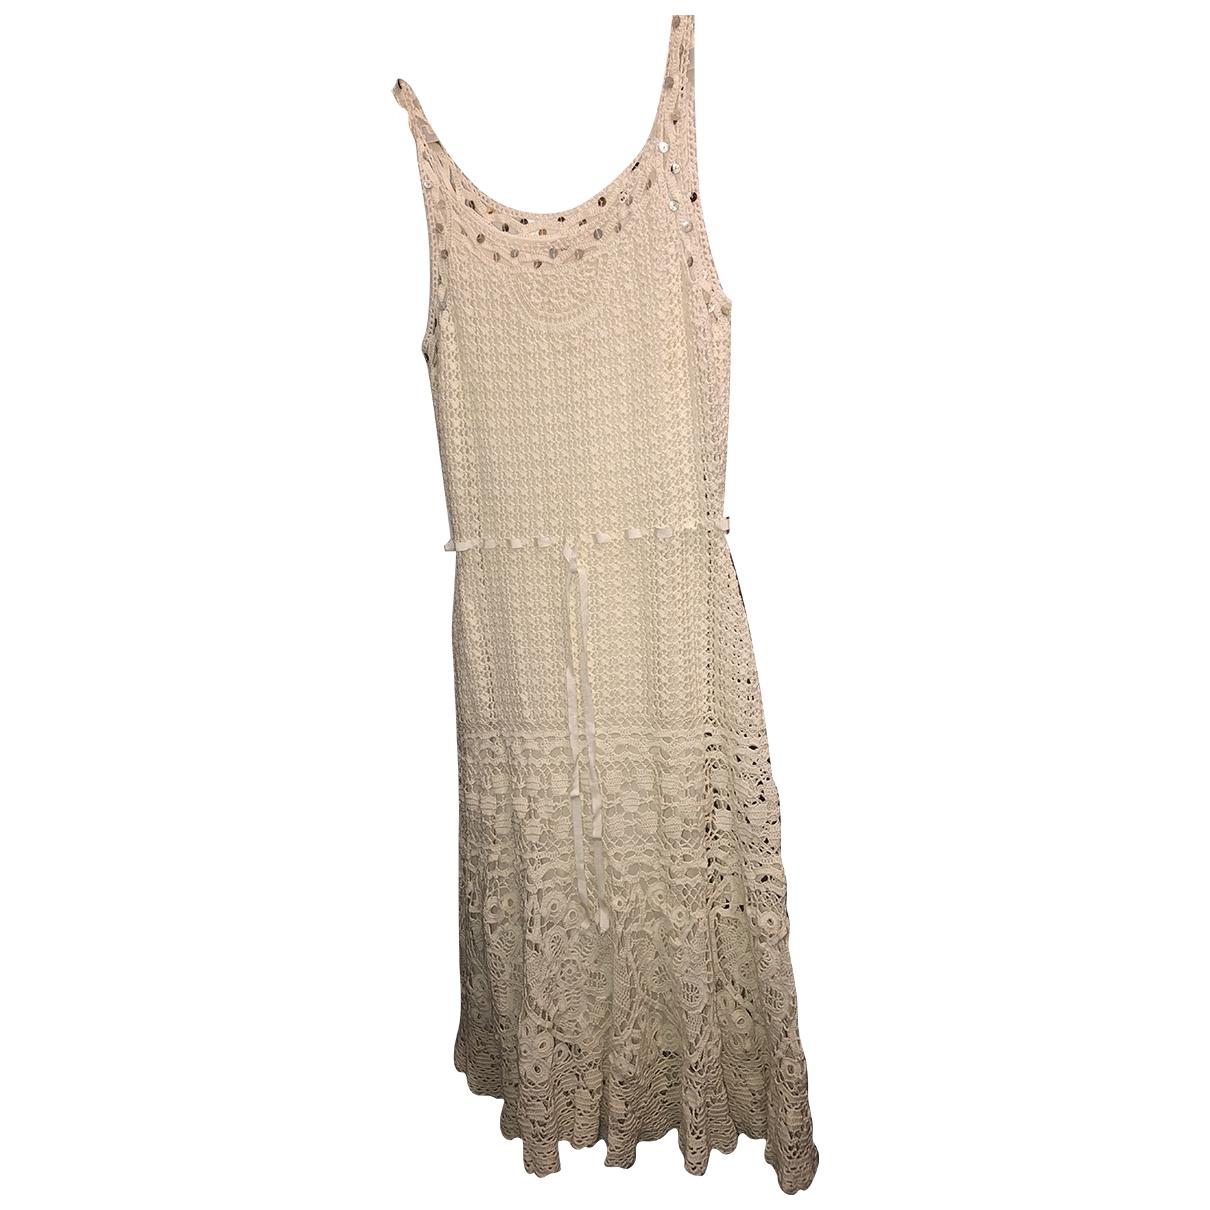 Laurel \N Ecru Cotton dress for Women 36 FR